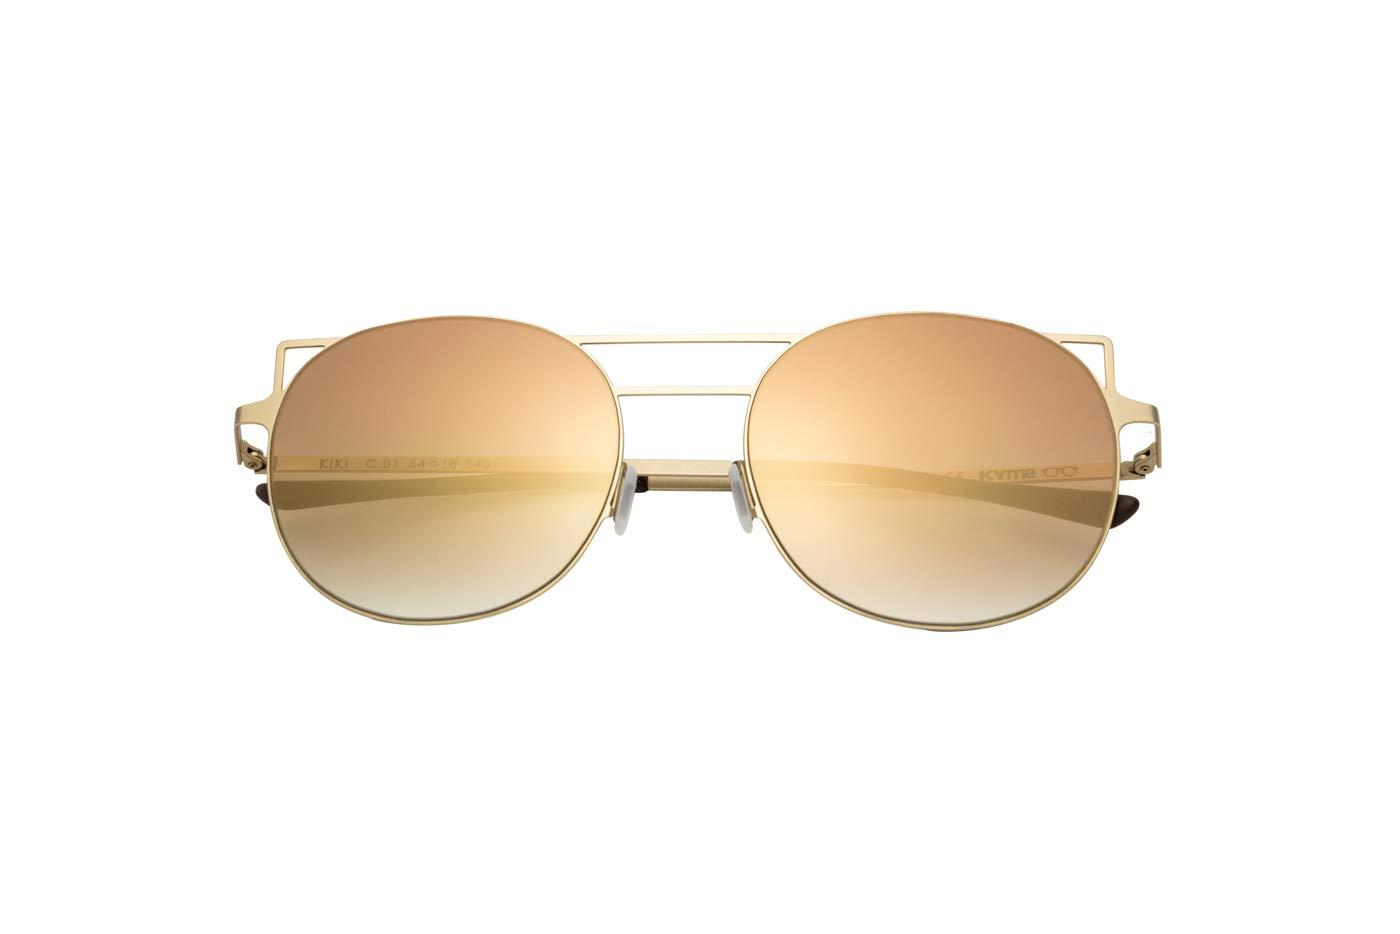 Sunglasses Kyme Kiki c.01 shiny gold flash gold 54 18 140 new